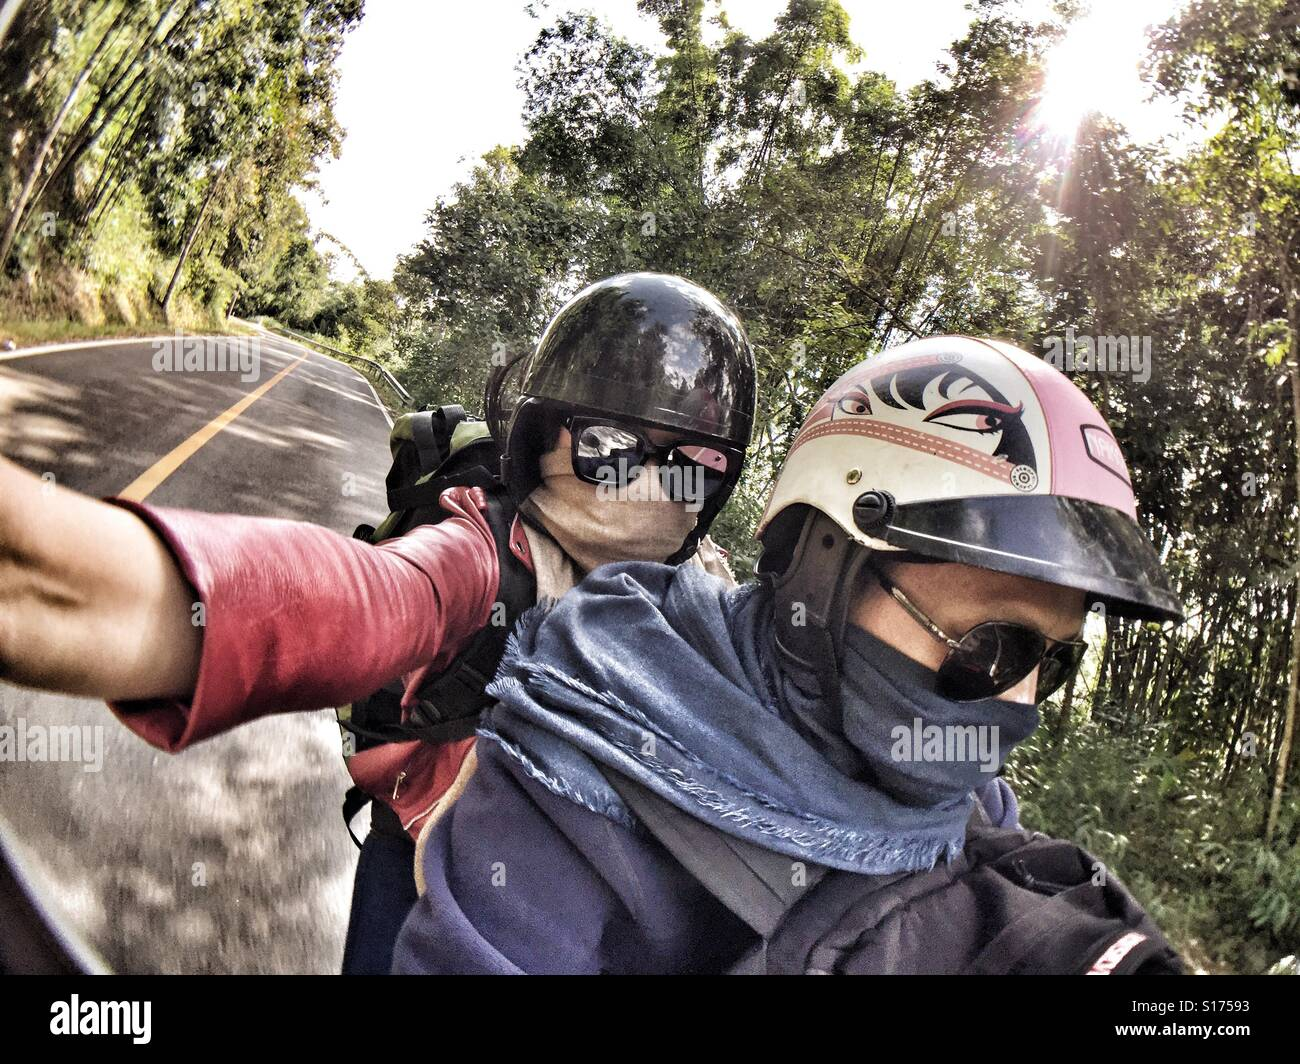 Reisenden Selfie auf Motorrad Stockfoto